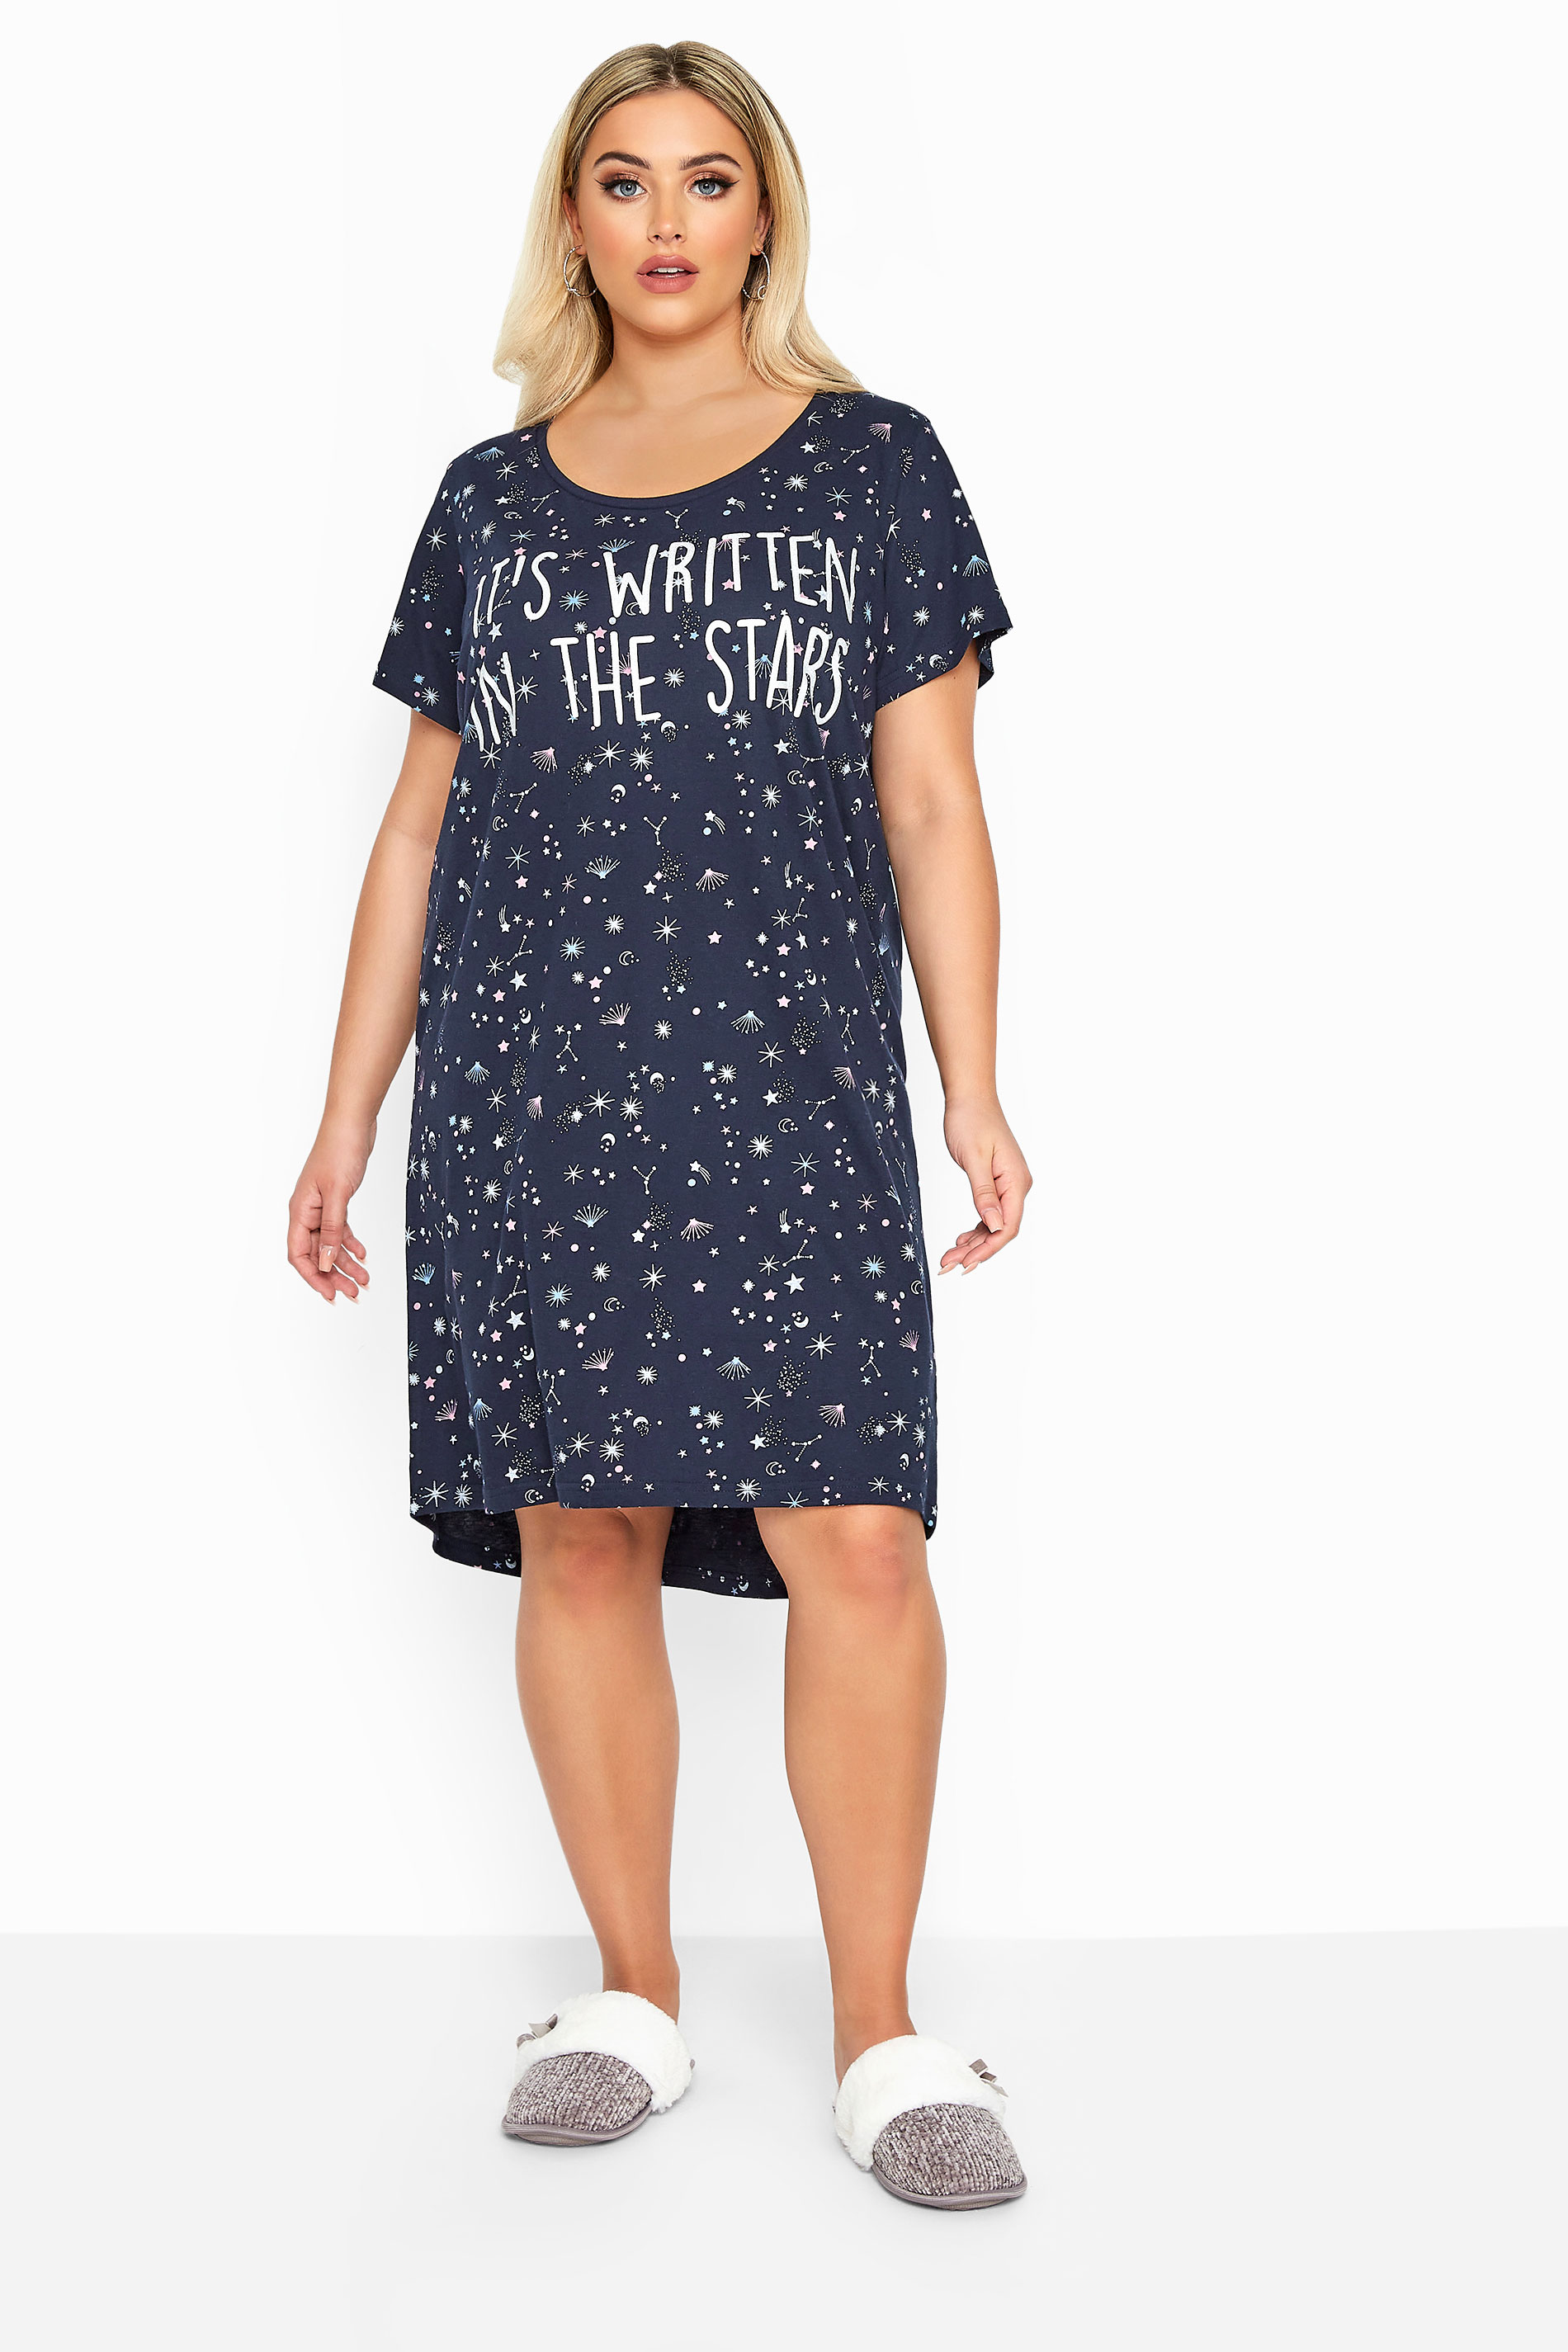 Navy Glitter Written In The Stars Slogan Nightdress